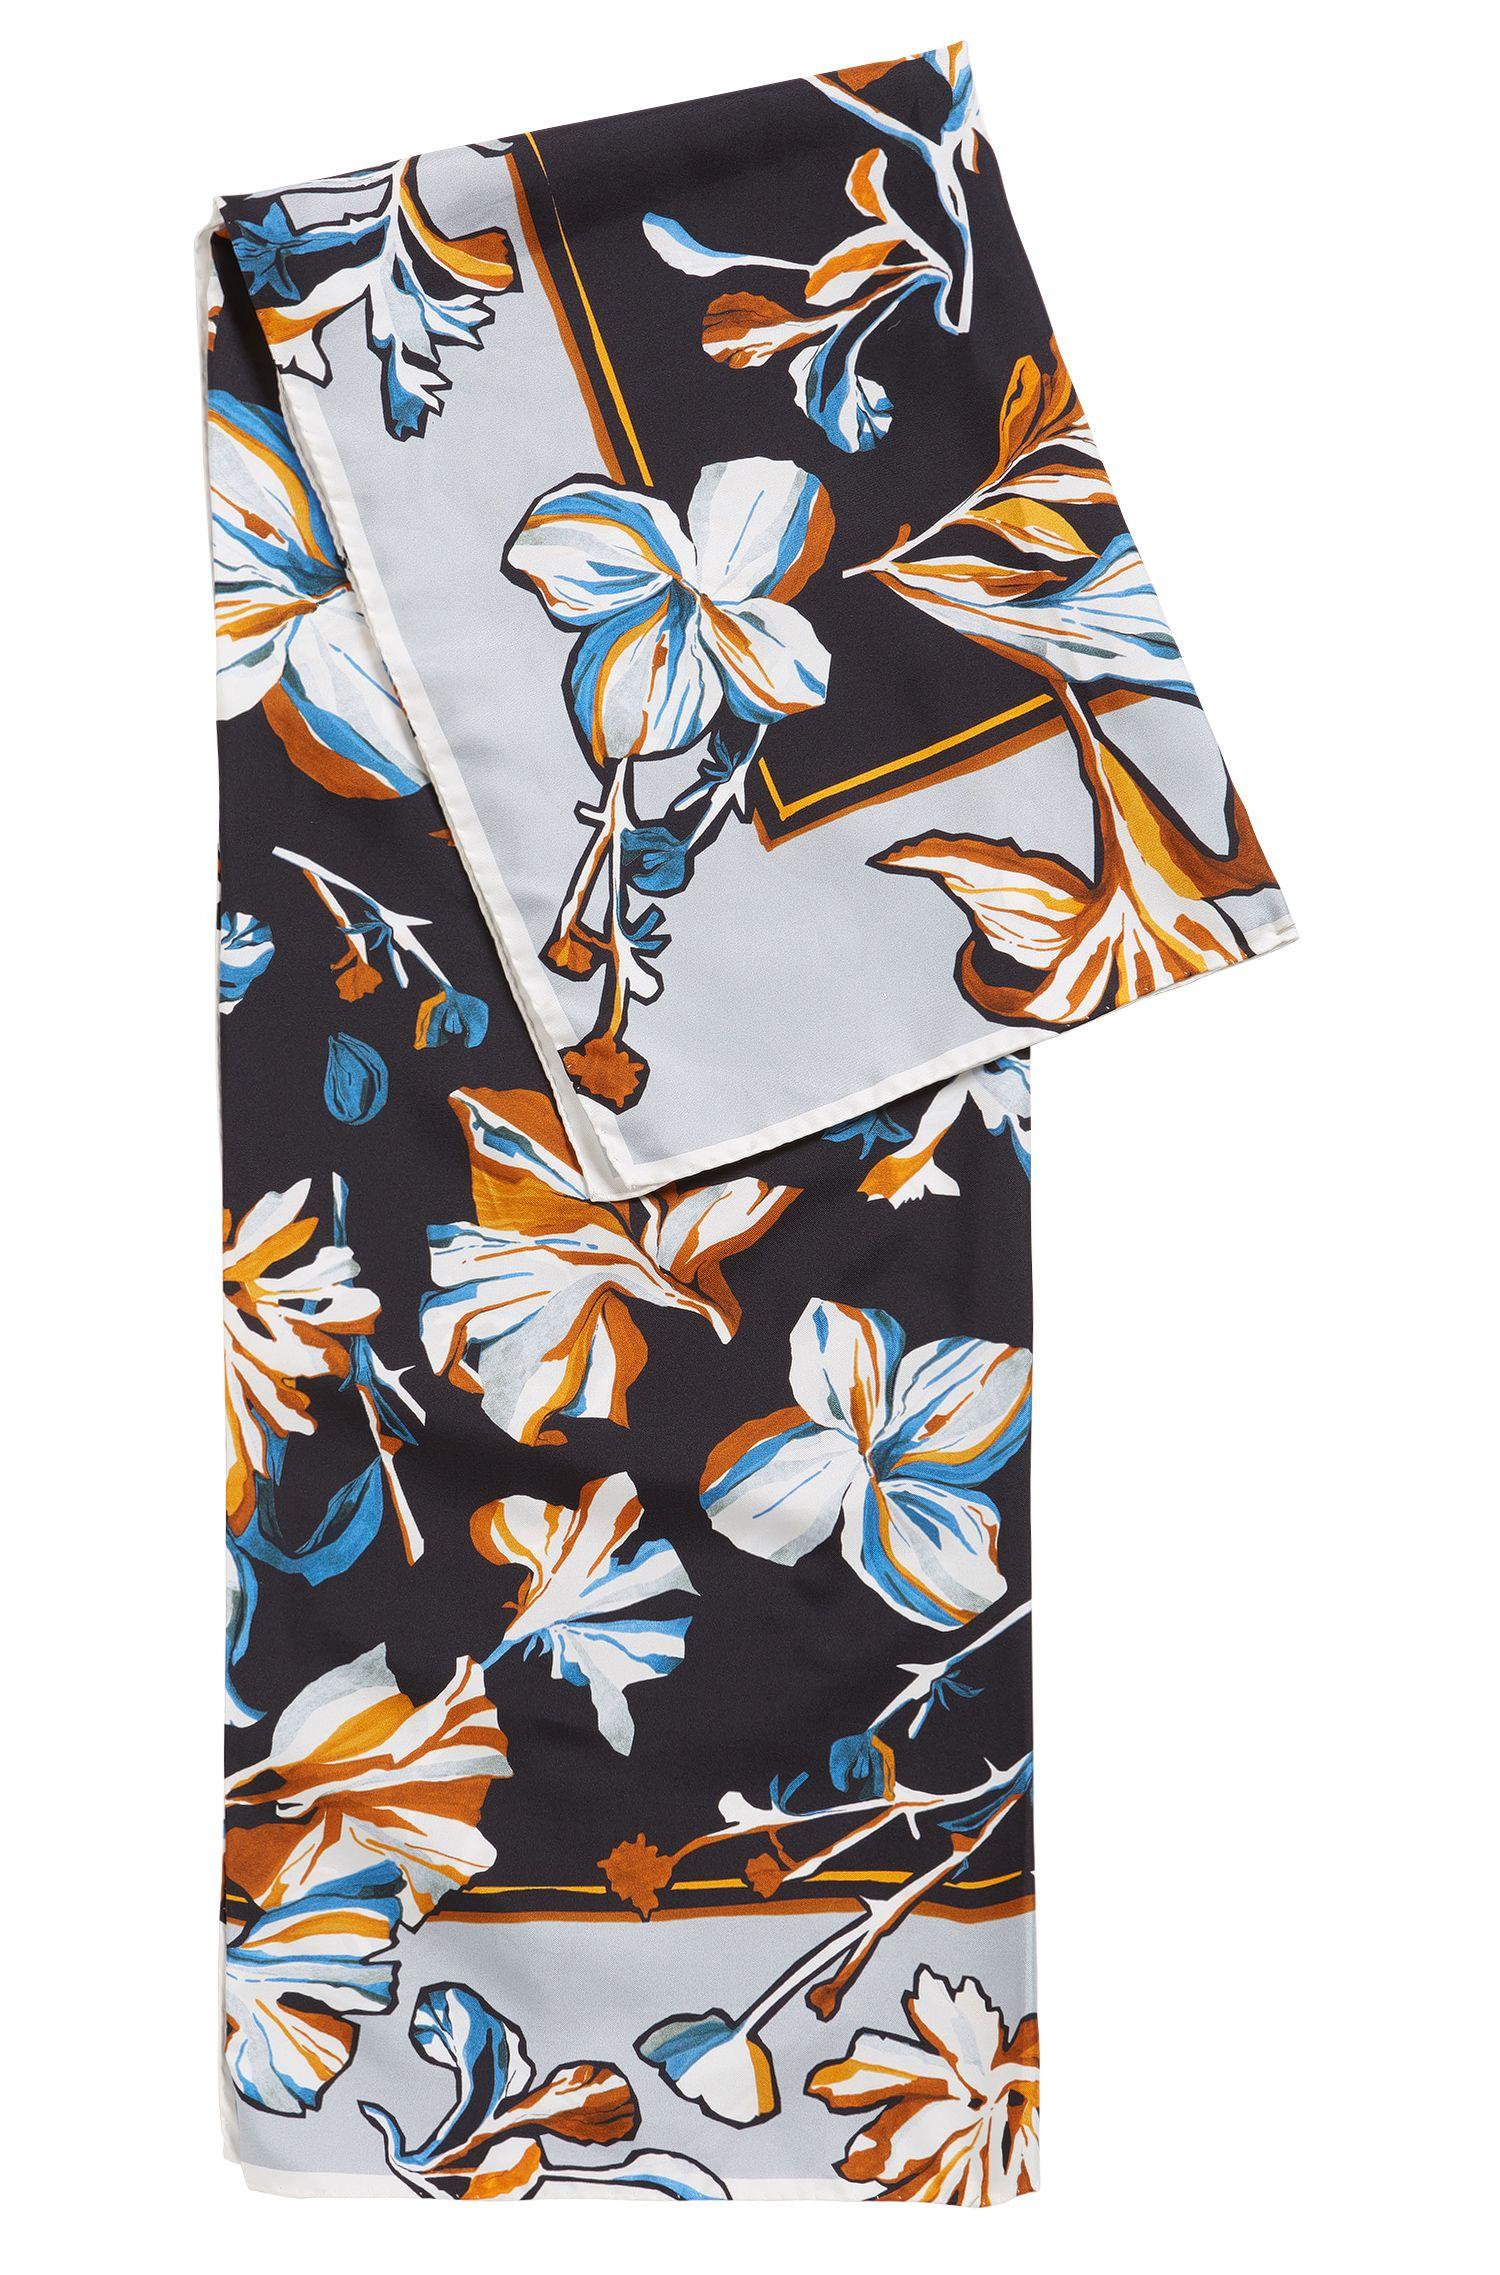 Floral Silk Scarf | Lorie